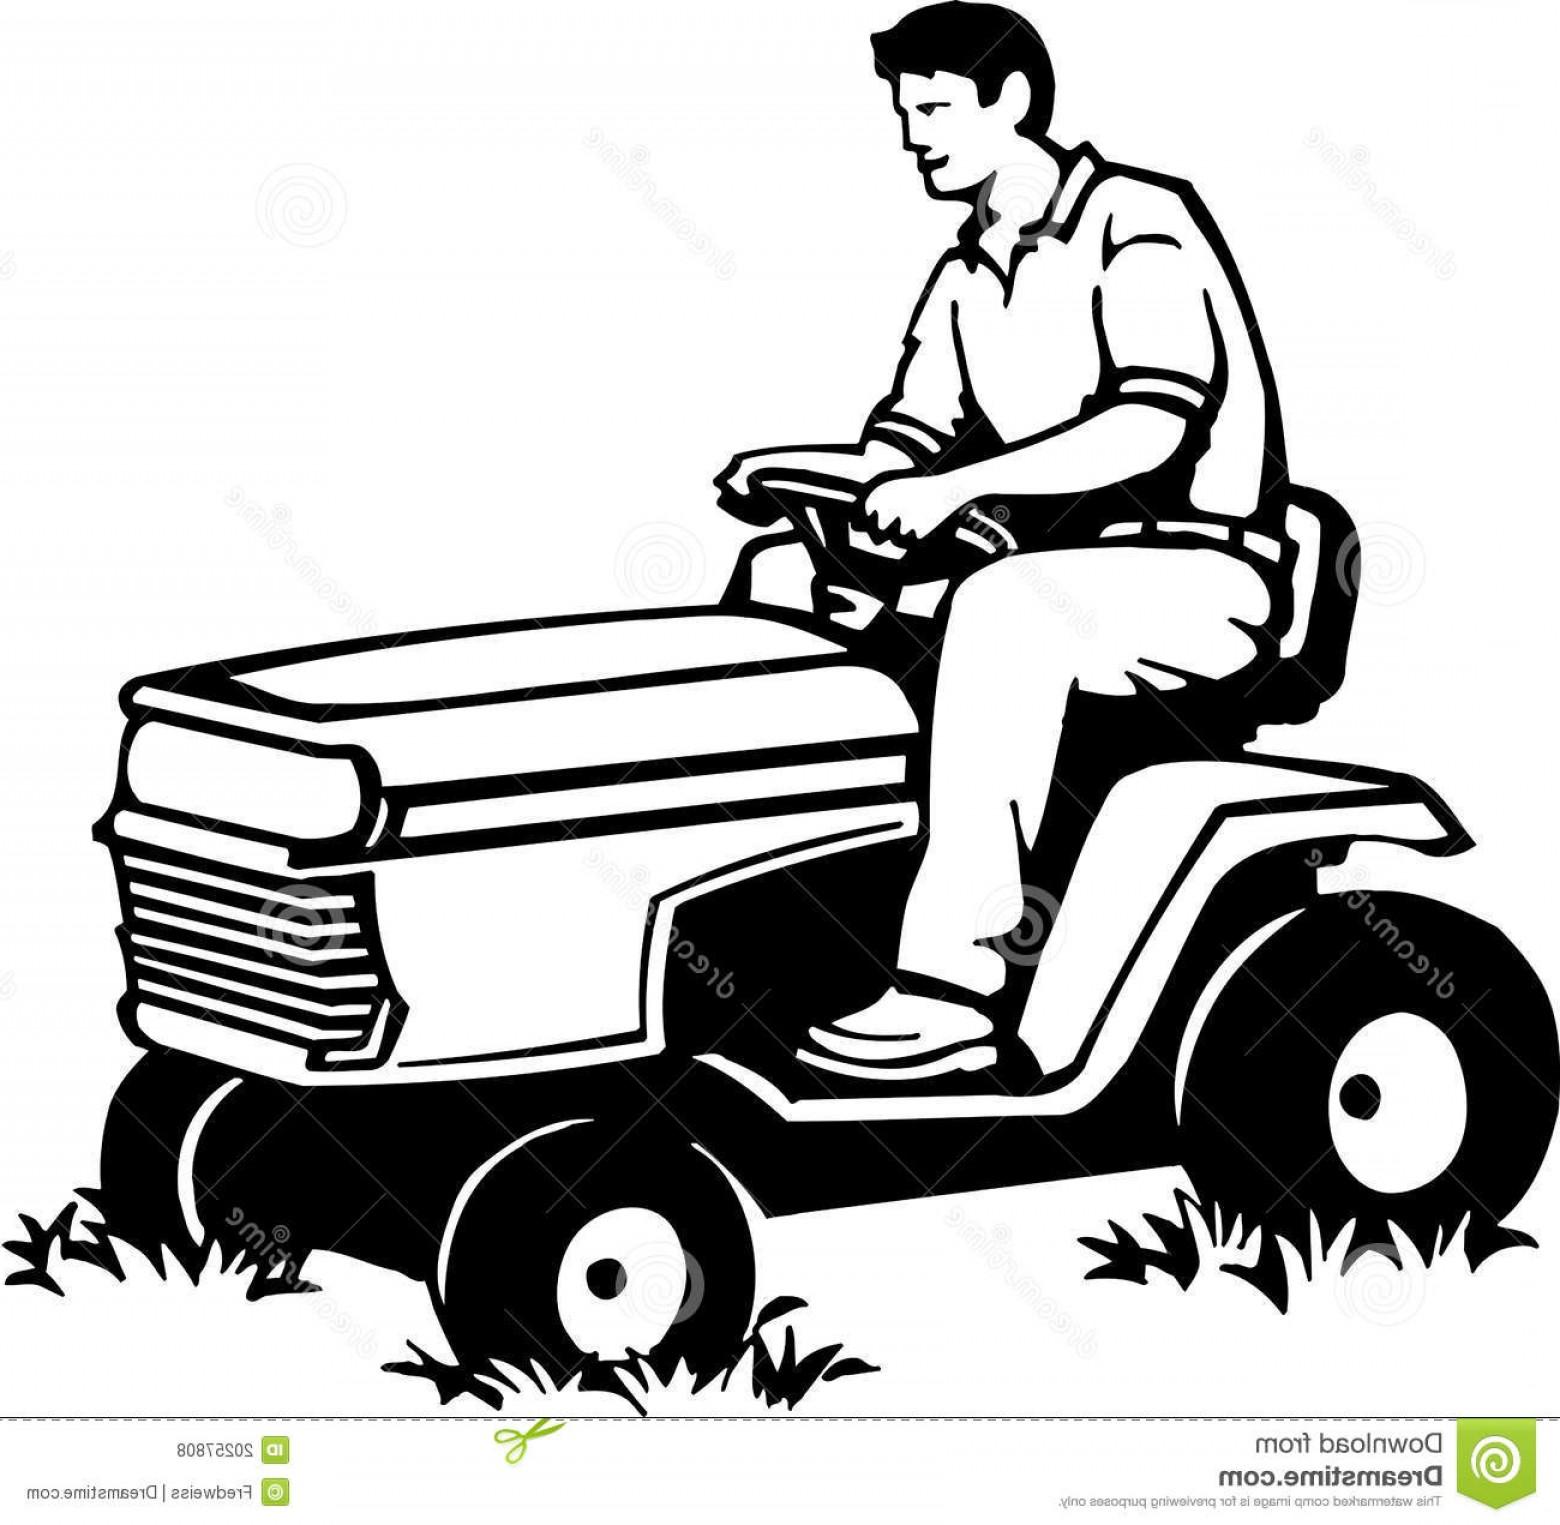 1560x1525 Royalty Free Stock Photos Riding Lawn Mower Image Shopatcloth